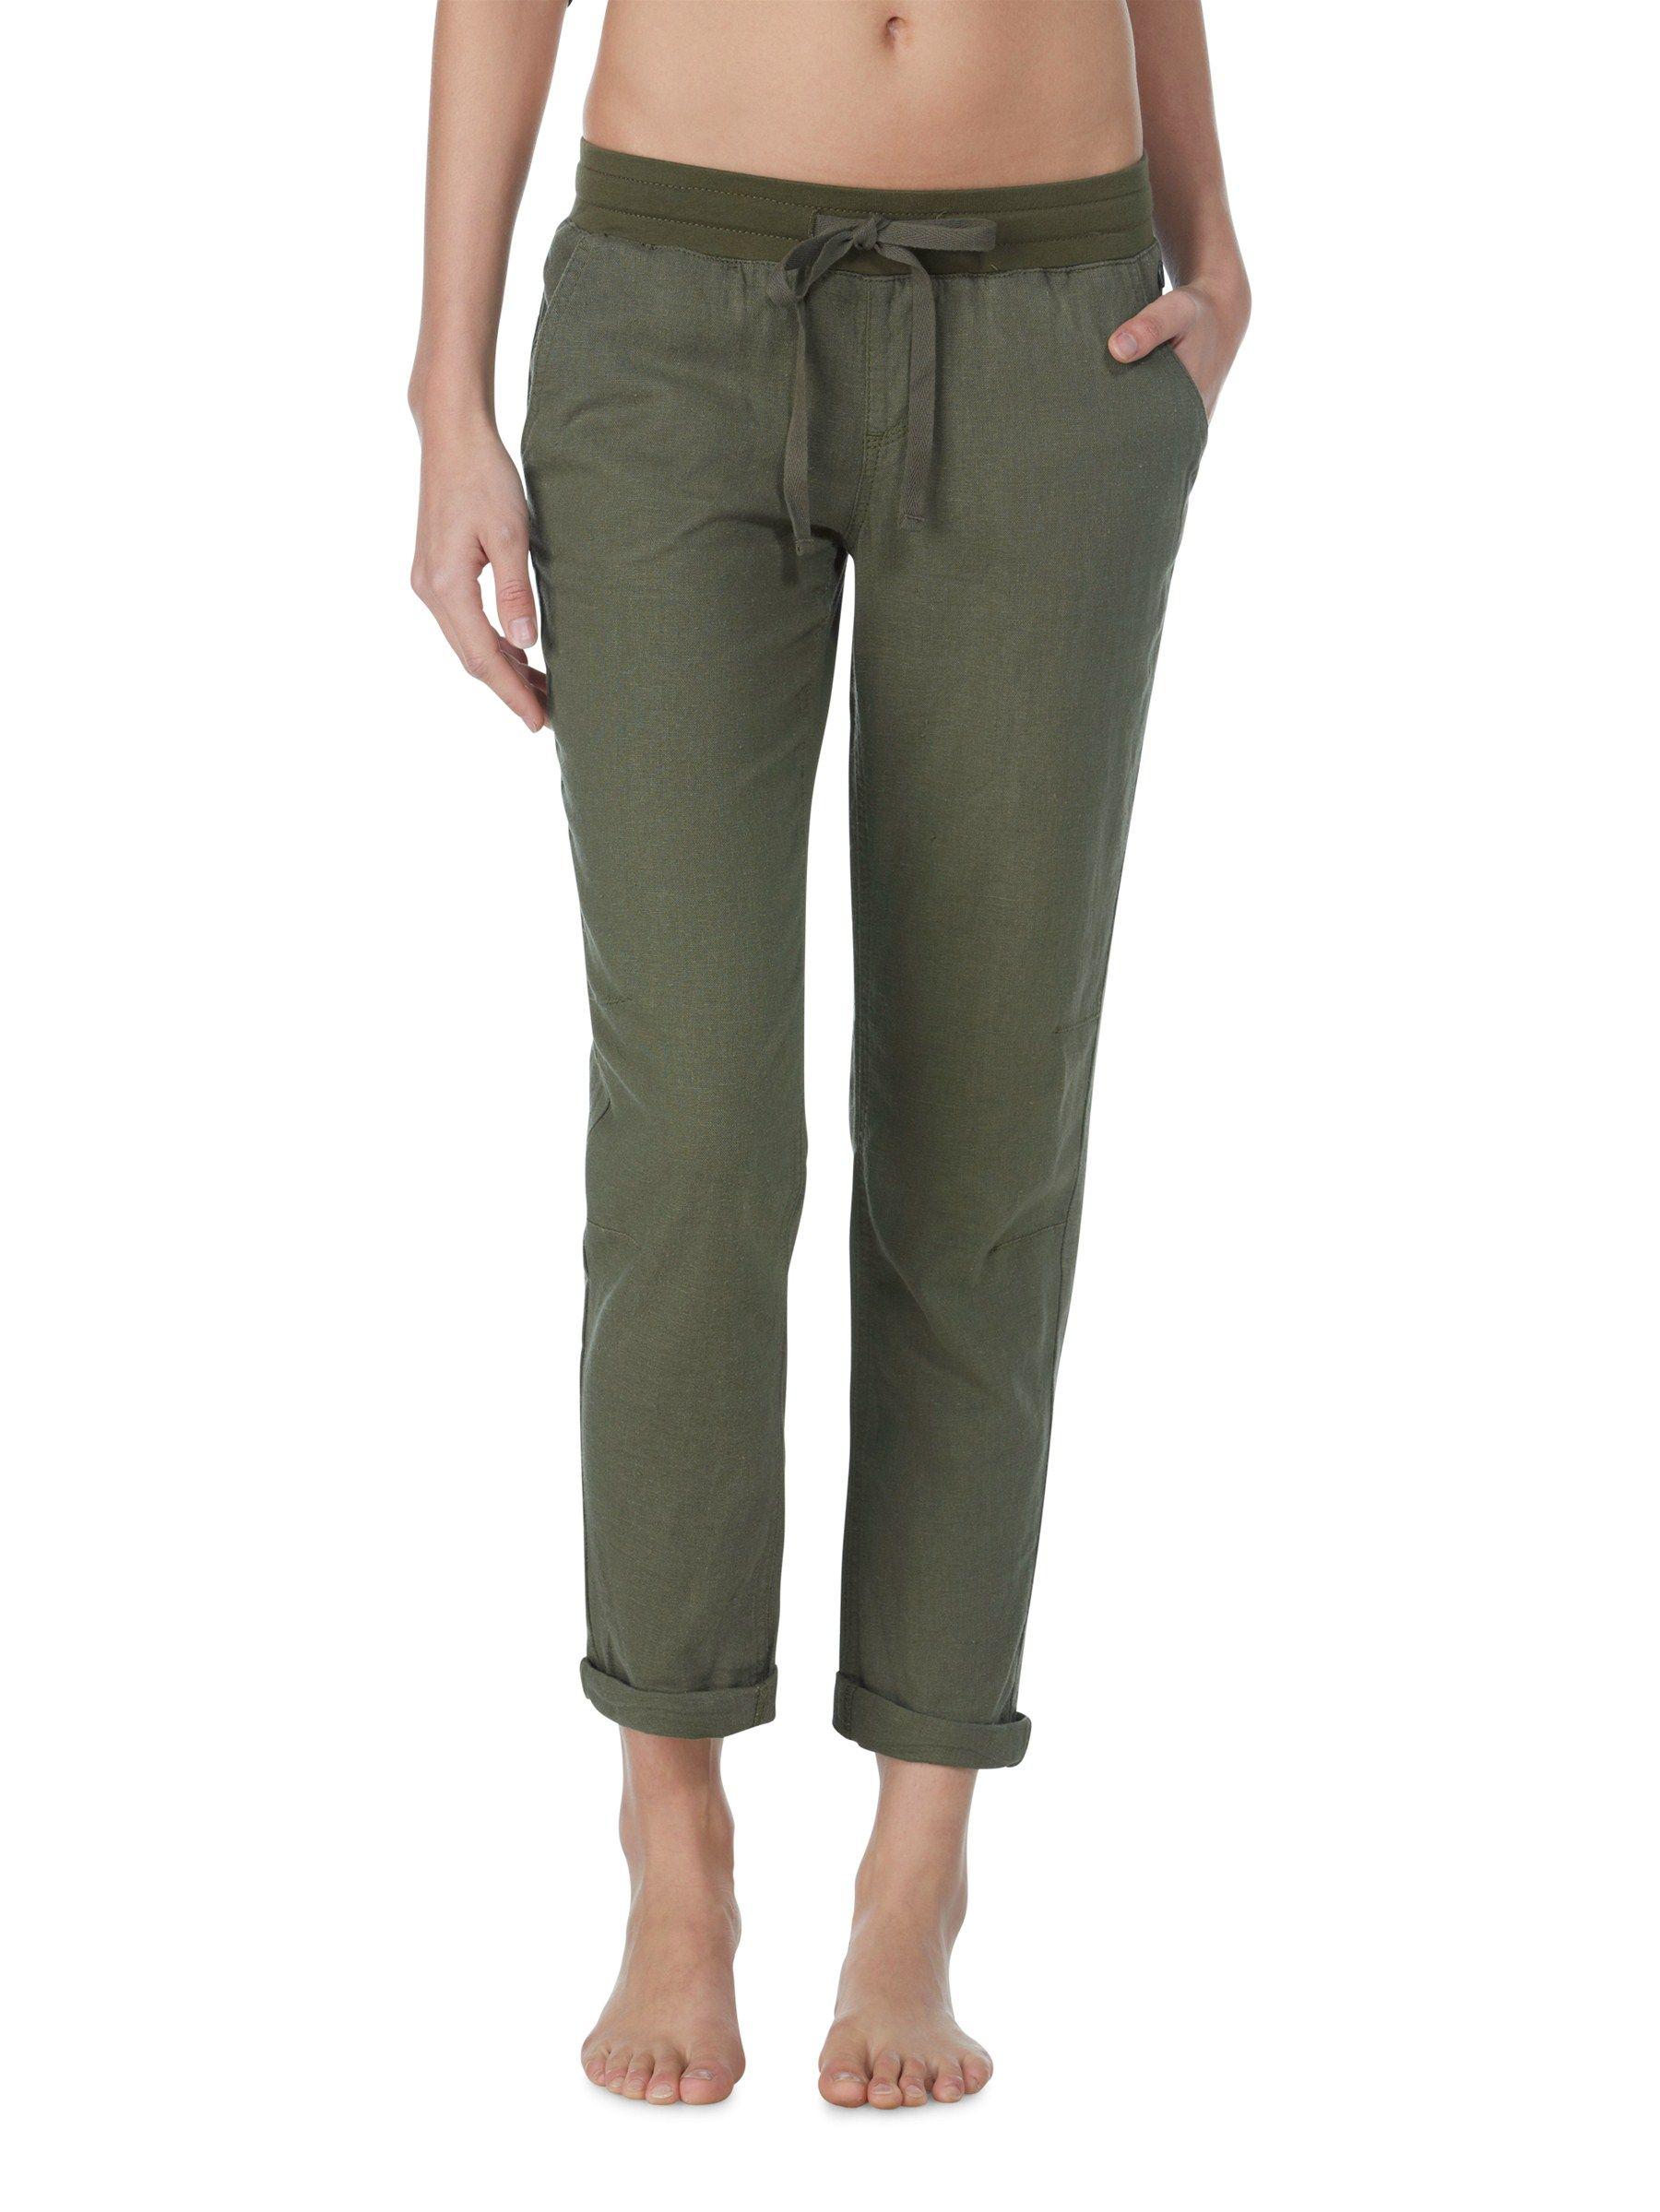 57c1177caa Love these Roxy linen pants | Clothes | Beach pants, Pants, Linen pants